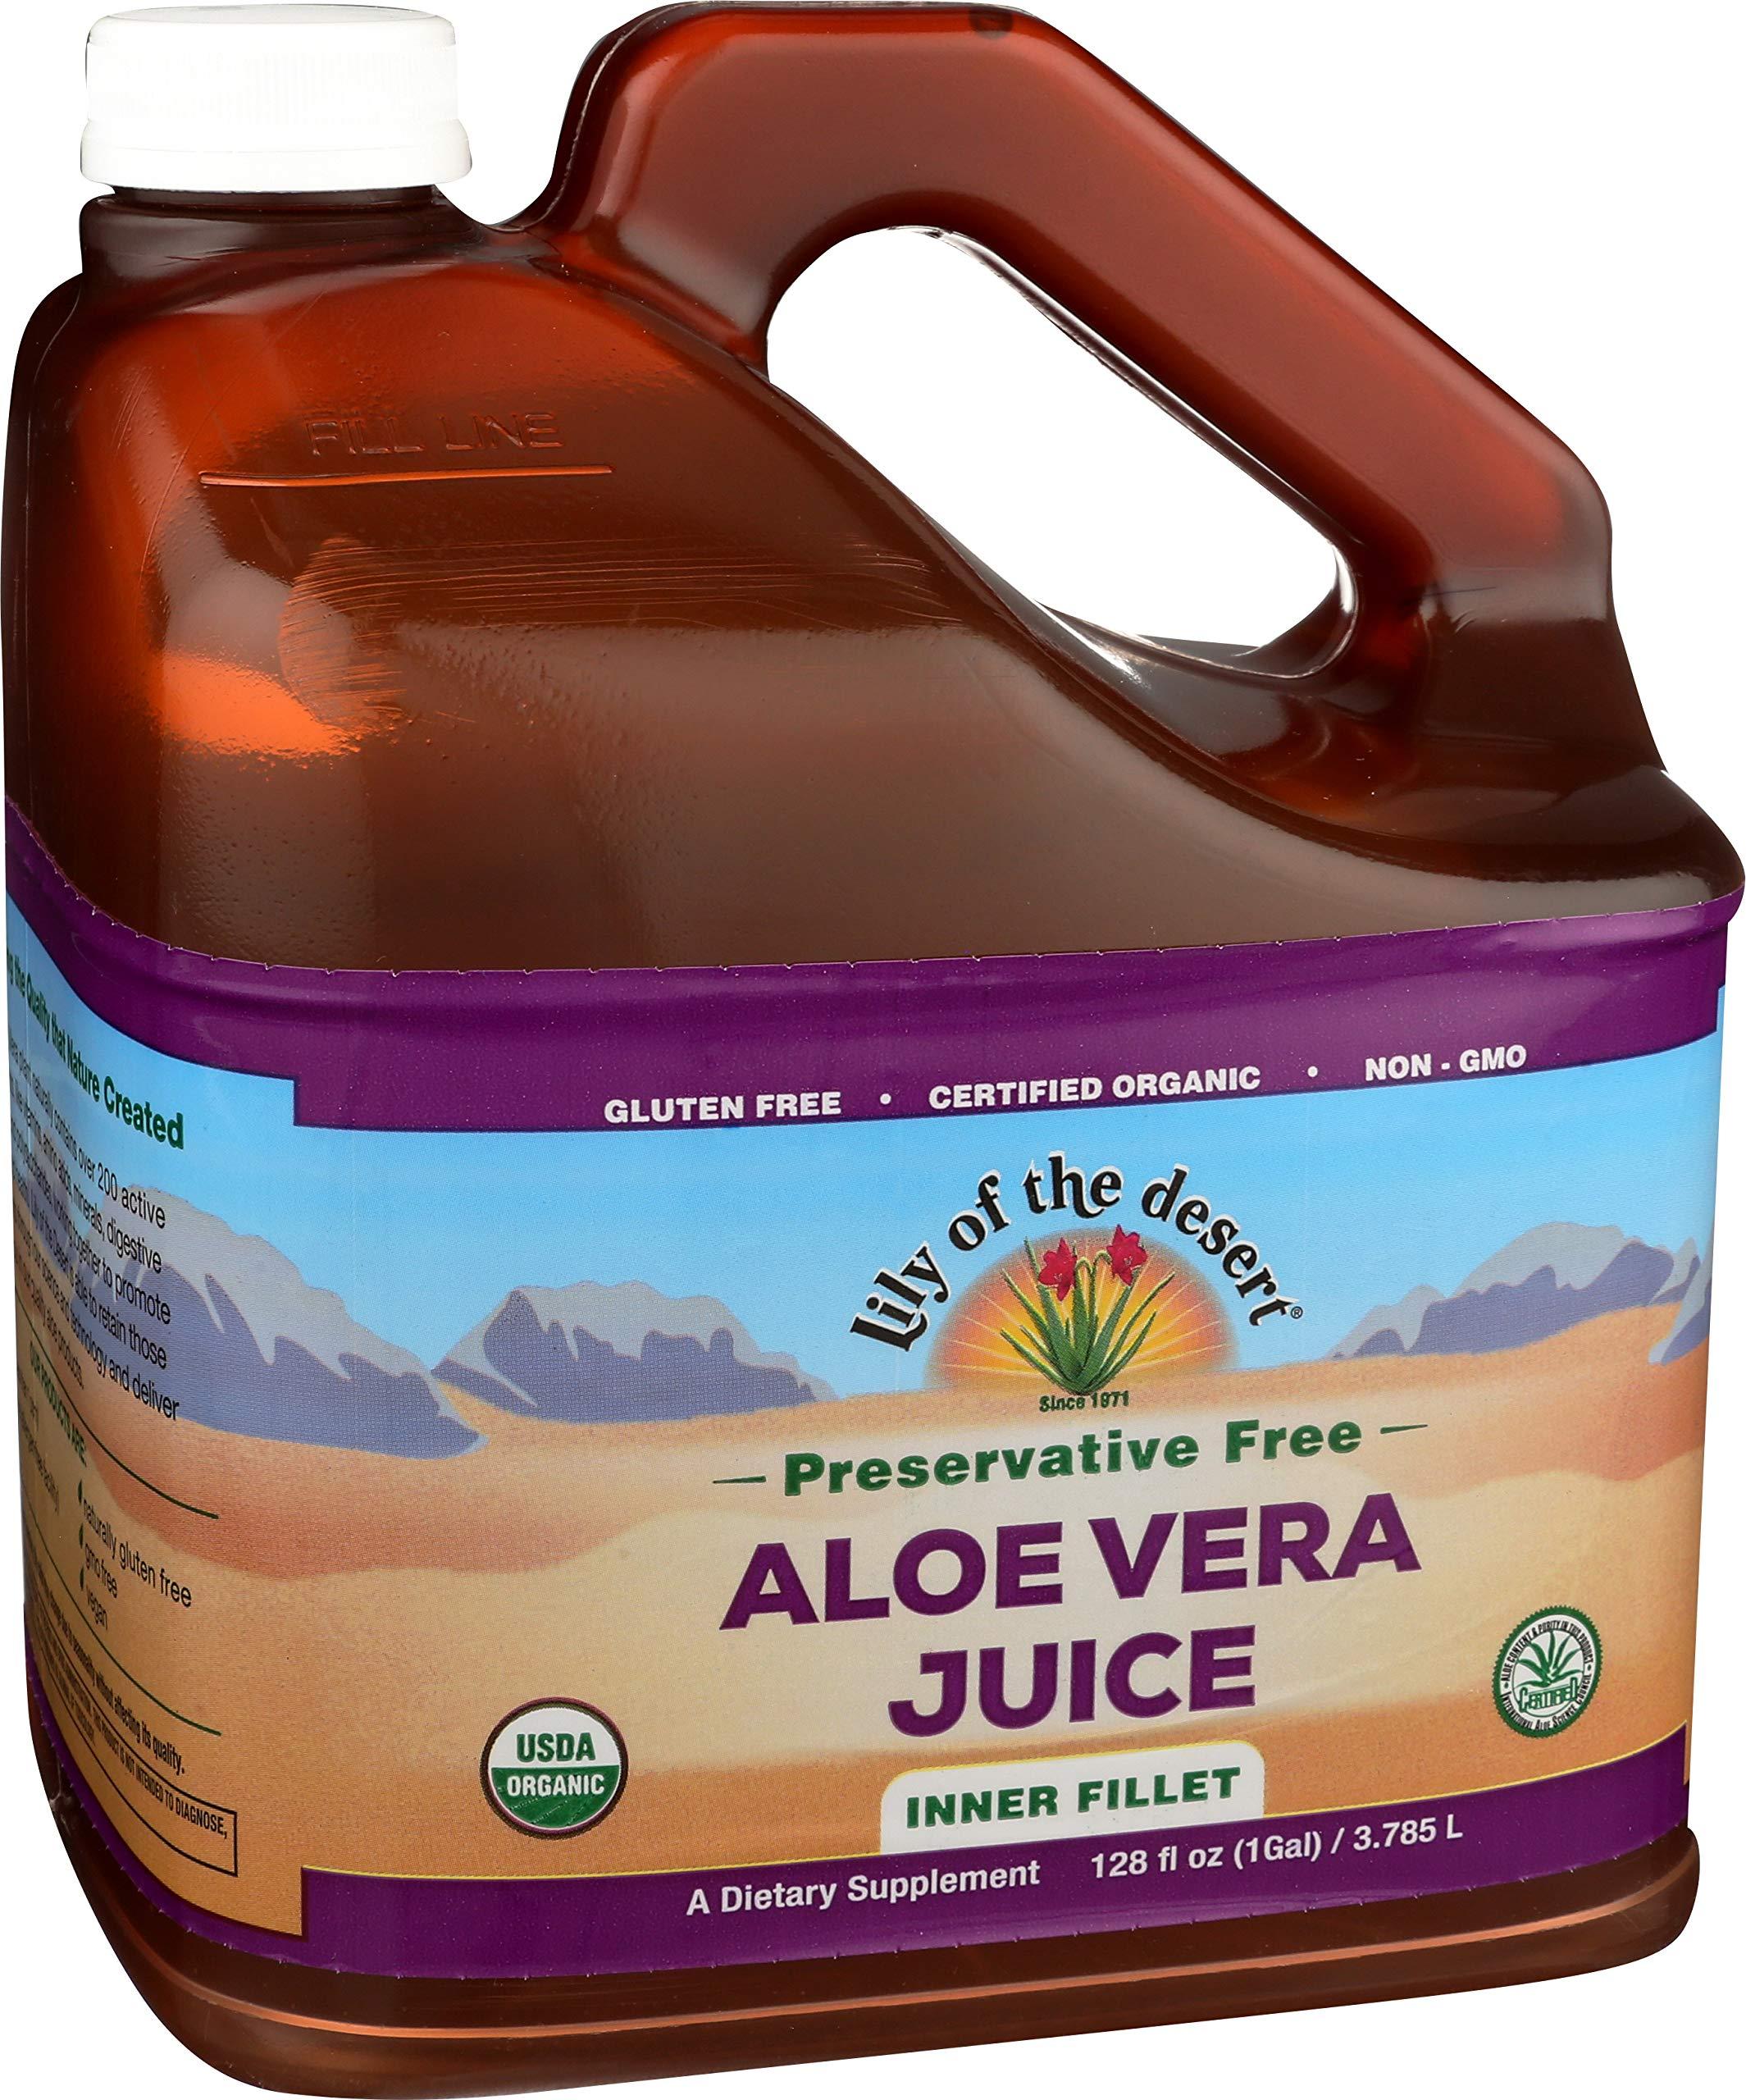 Lily of the Desert Aloe Vera Juice, No Preservatives, Inner Fillet, 128 Ounces